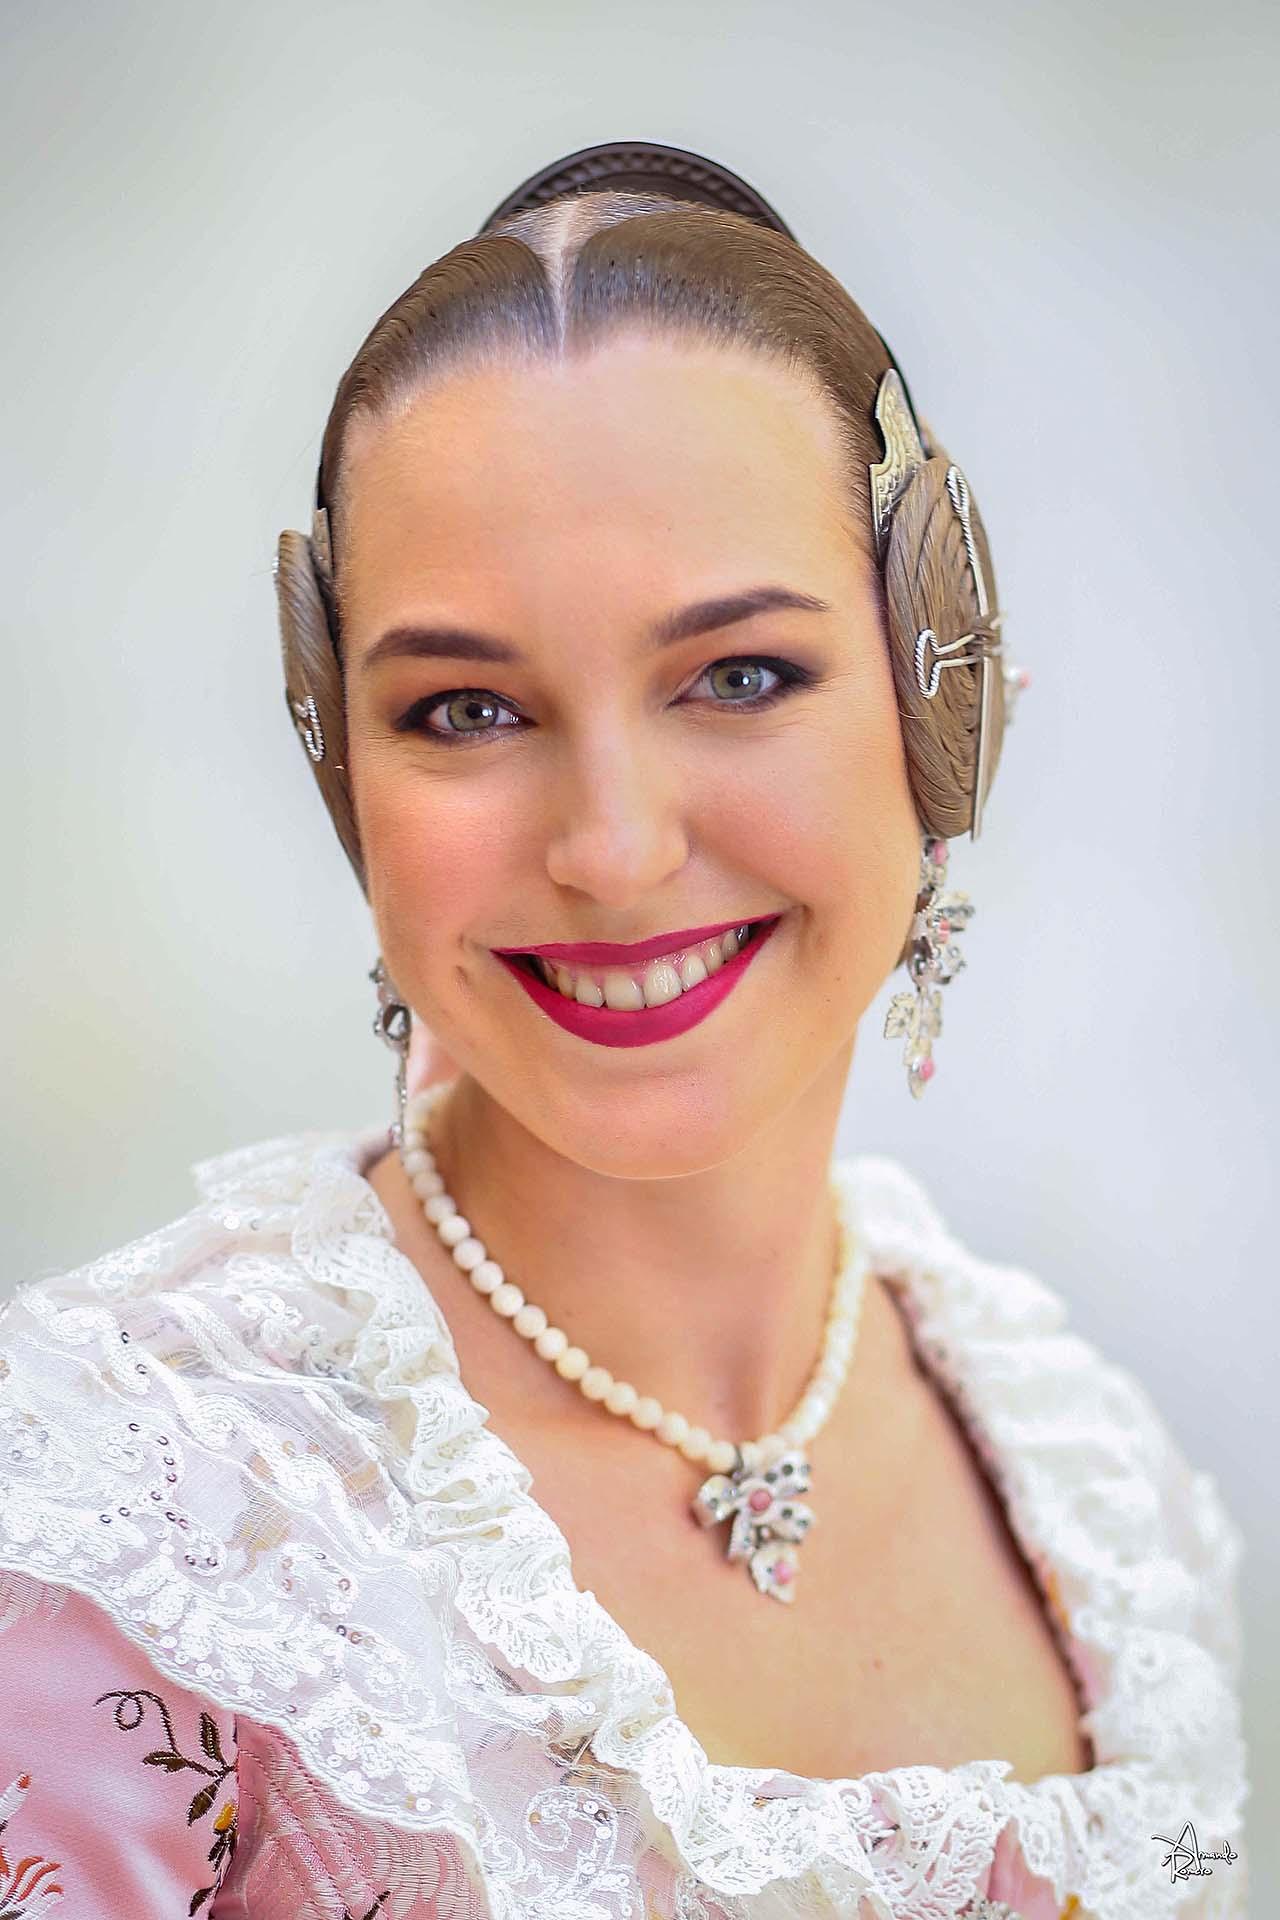 Paula Santarrufina Terrasa